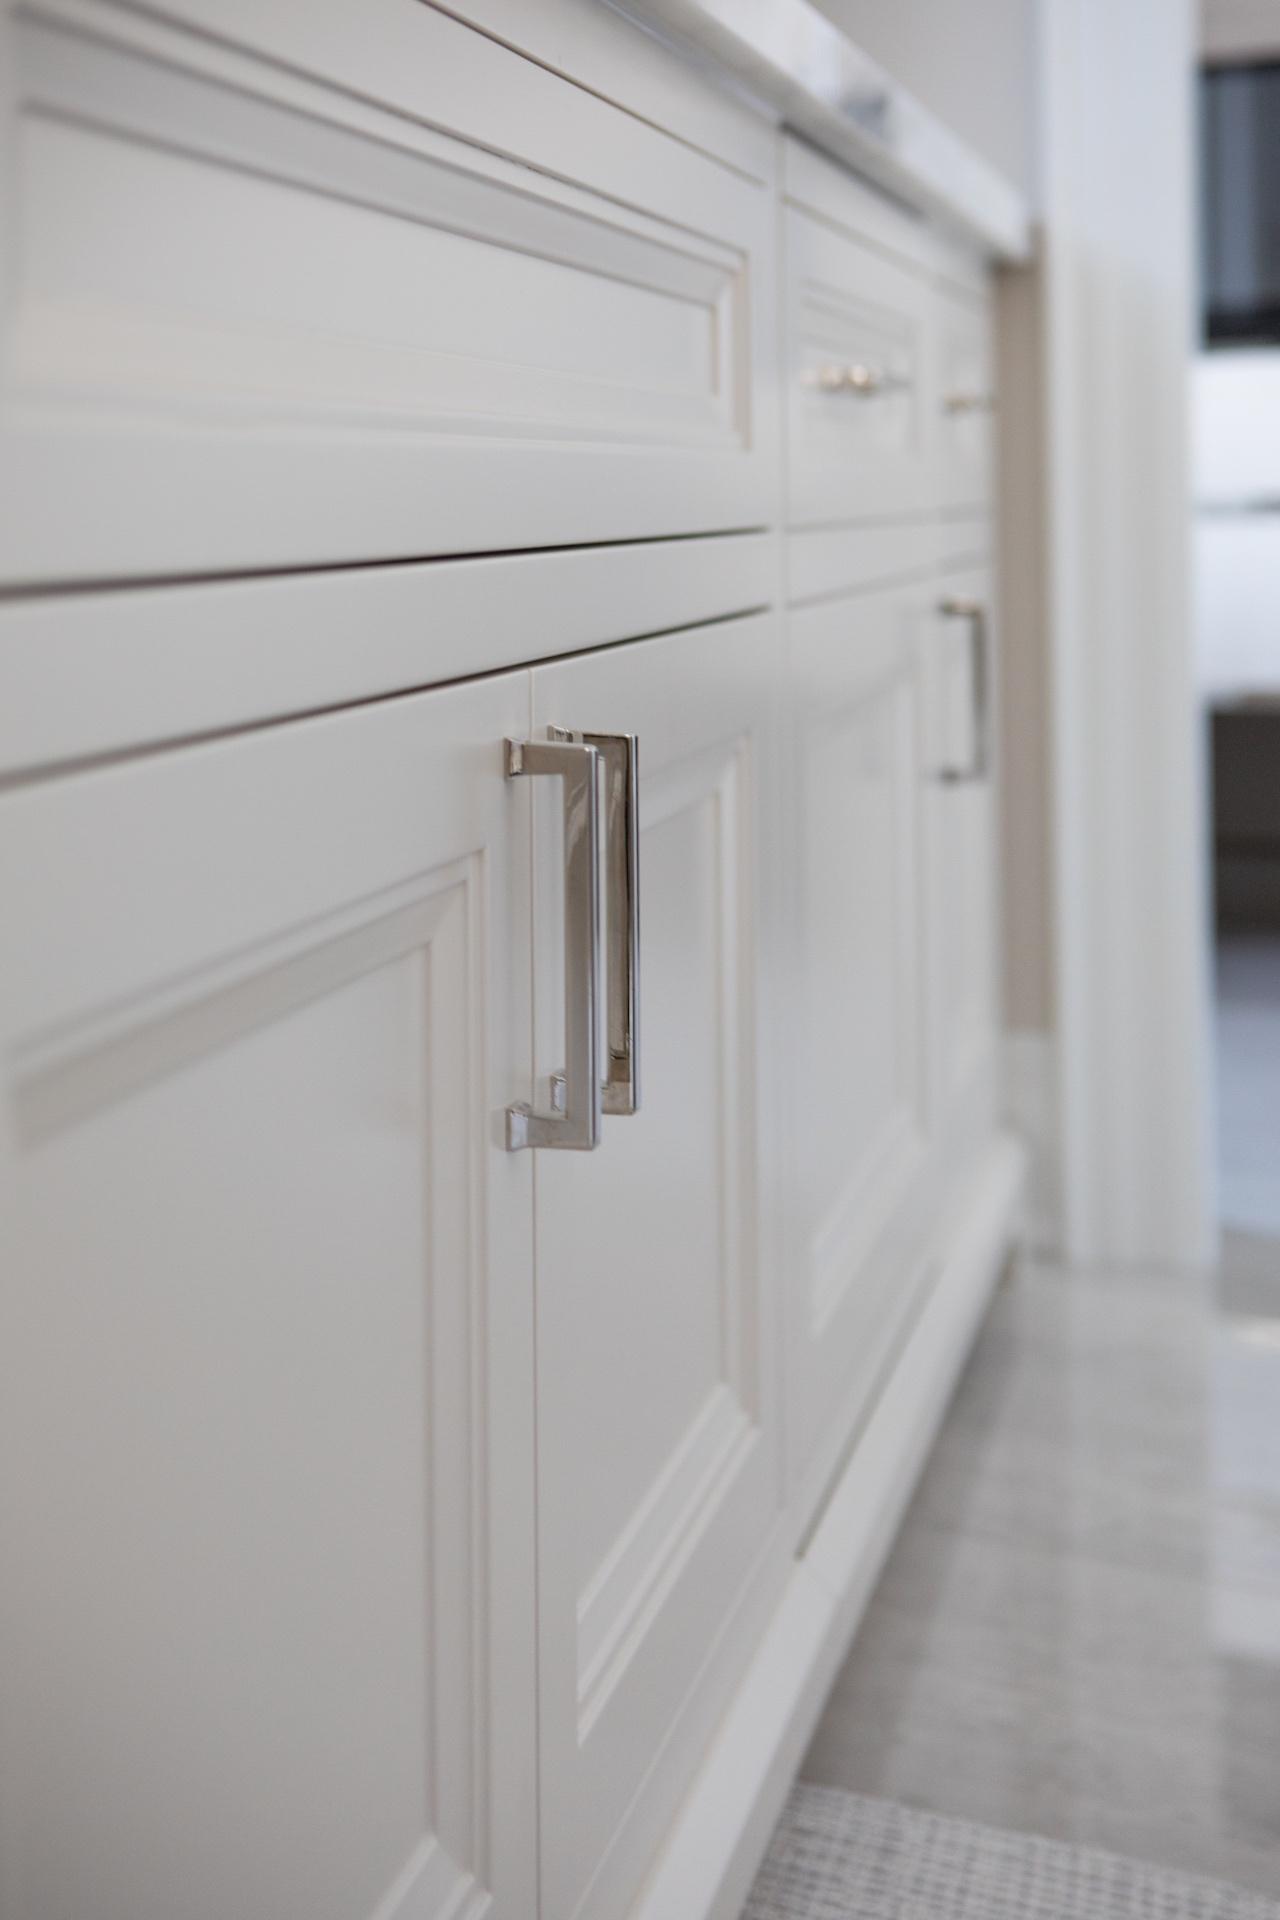 Cabinets with silver door handles